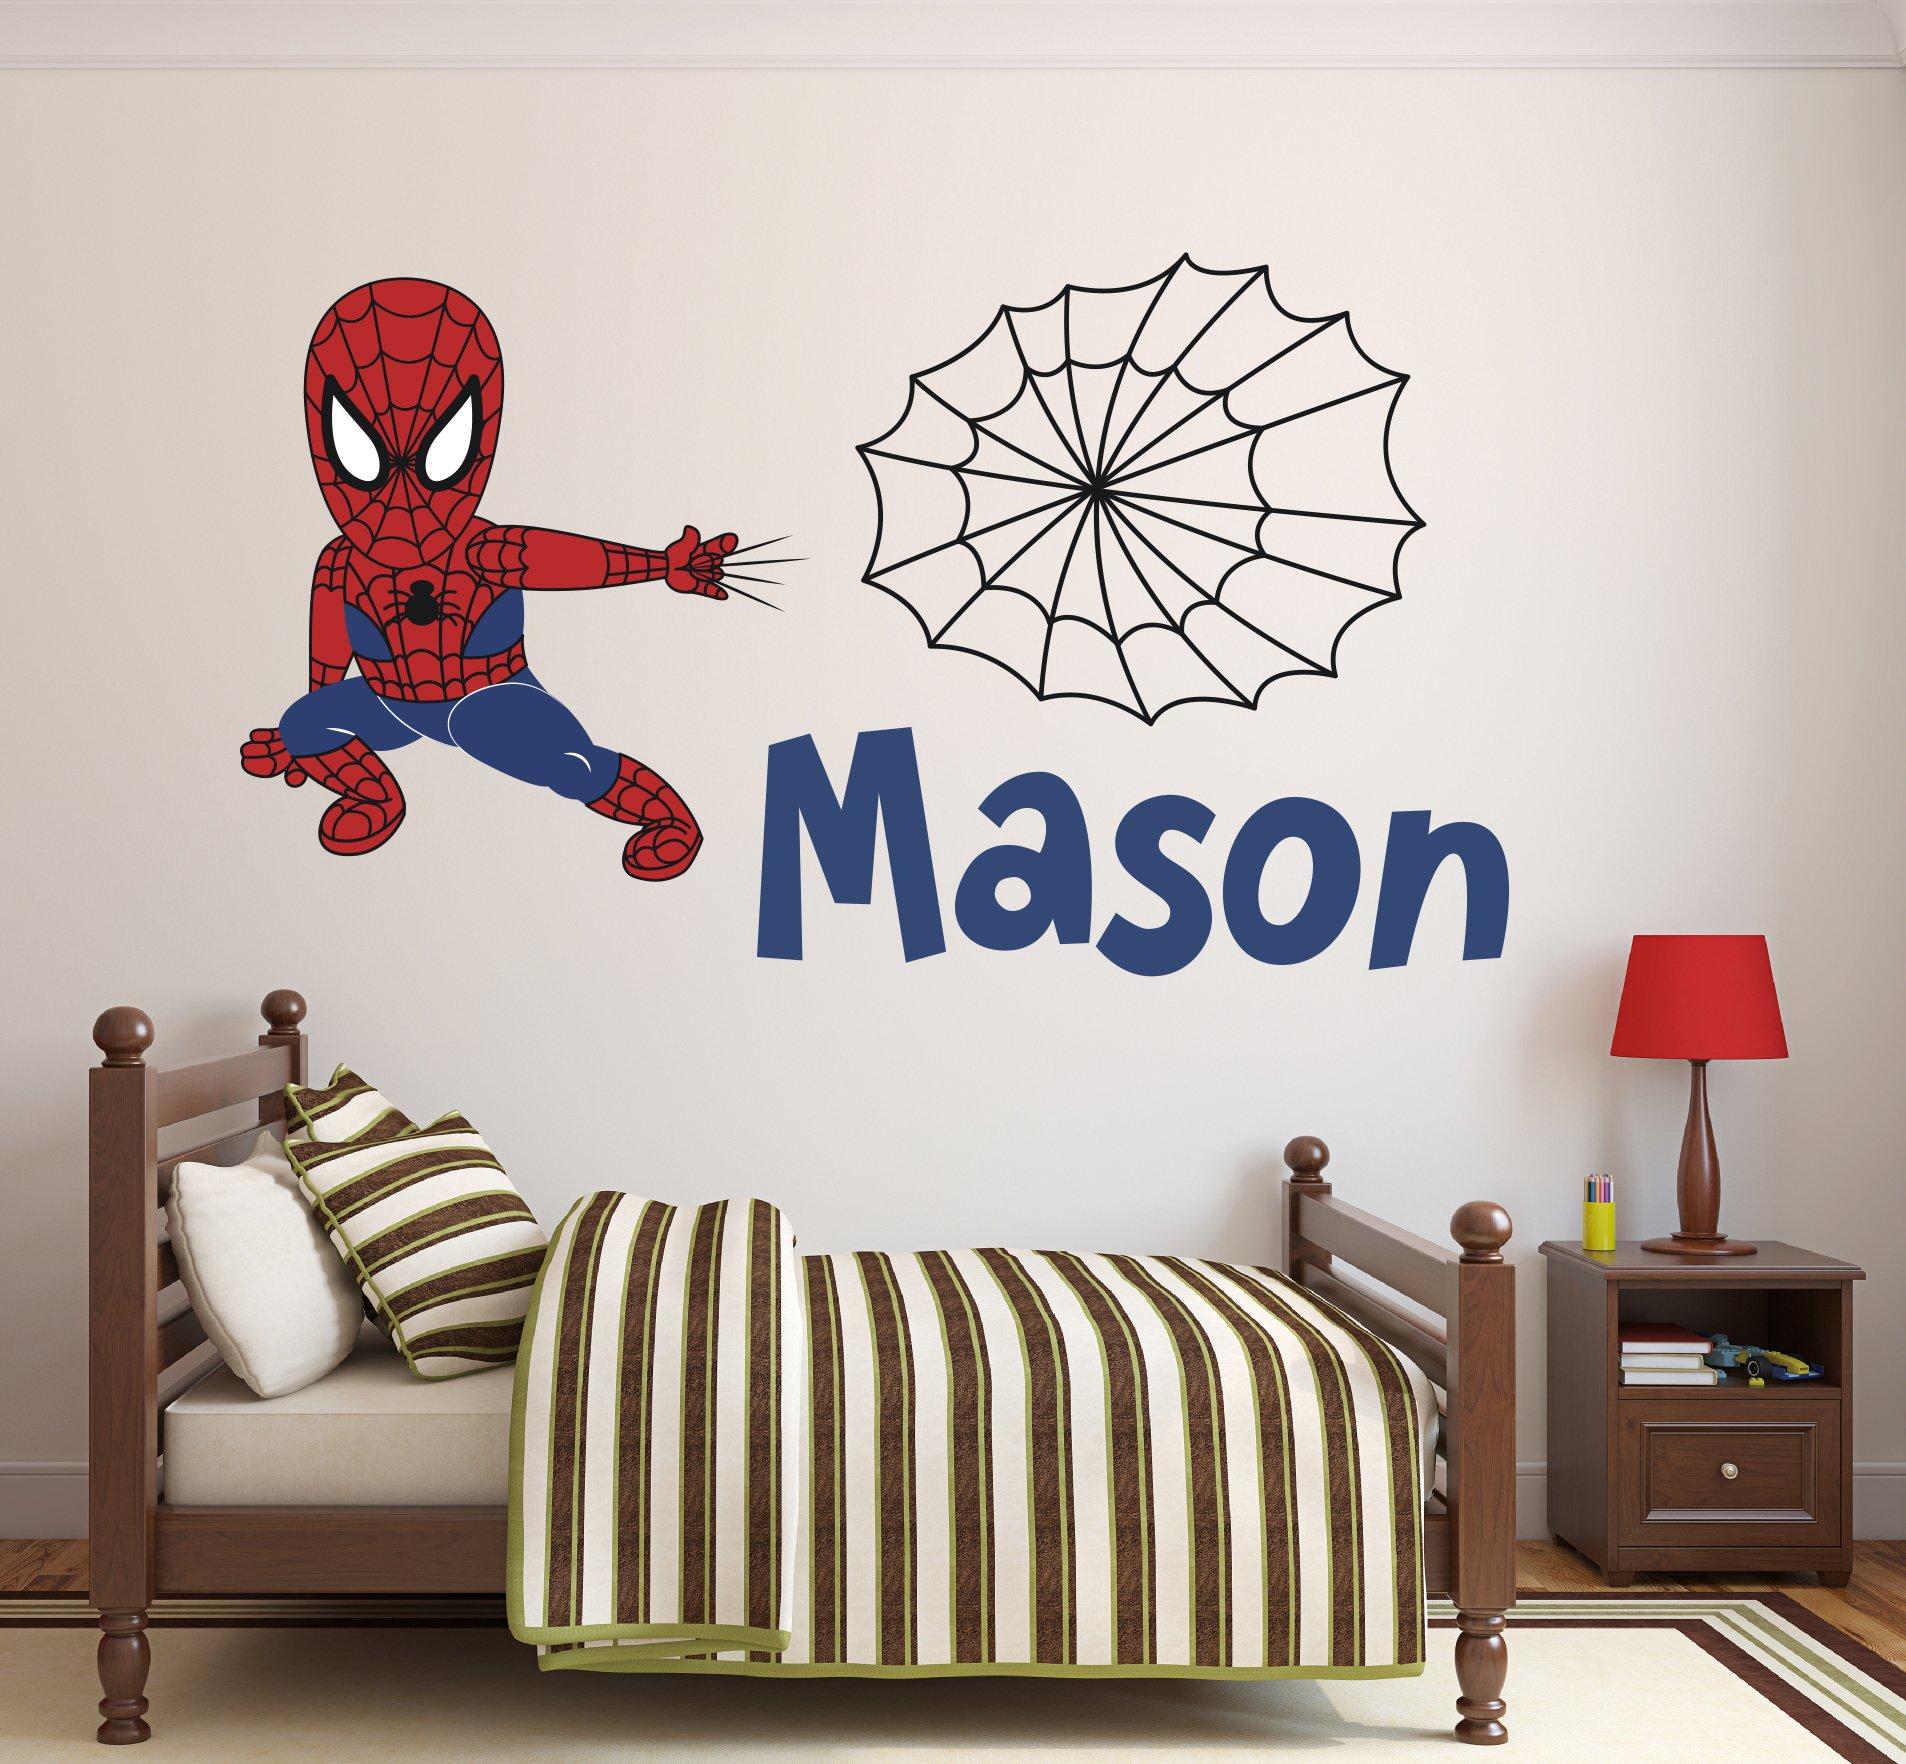 Custom Name Spiderman Wall Decal Baby Boy Kids Decor Personalized Nursery Gift Vinyl Art (42''W x 22''H) by Pinkie Penguin